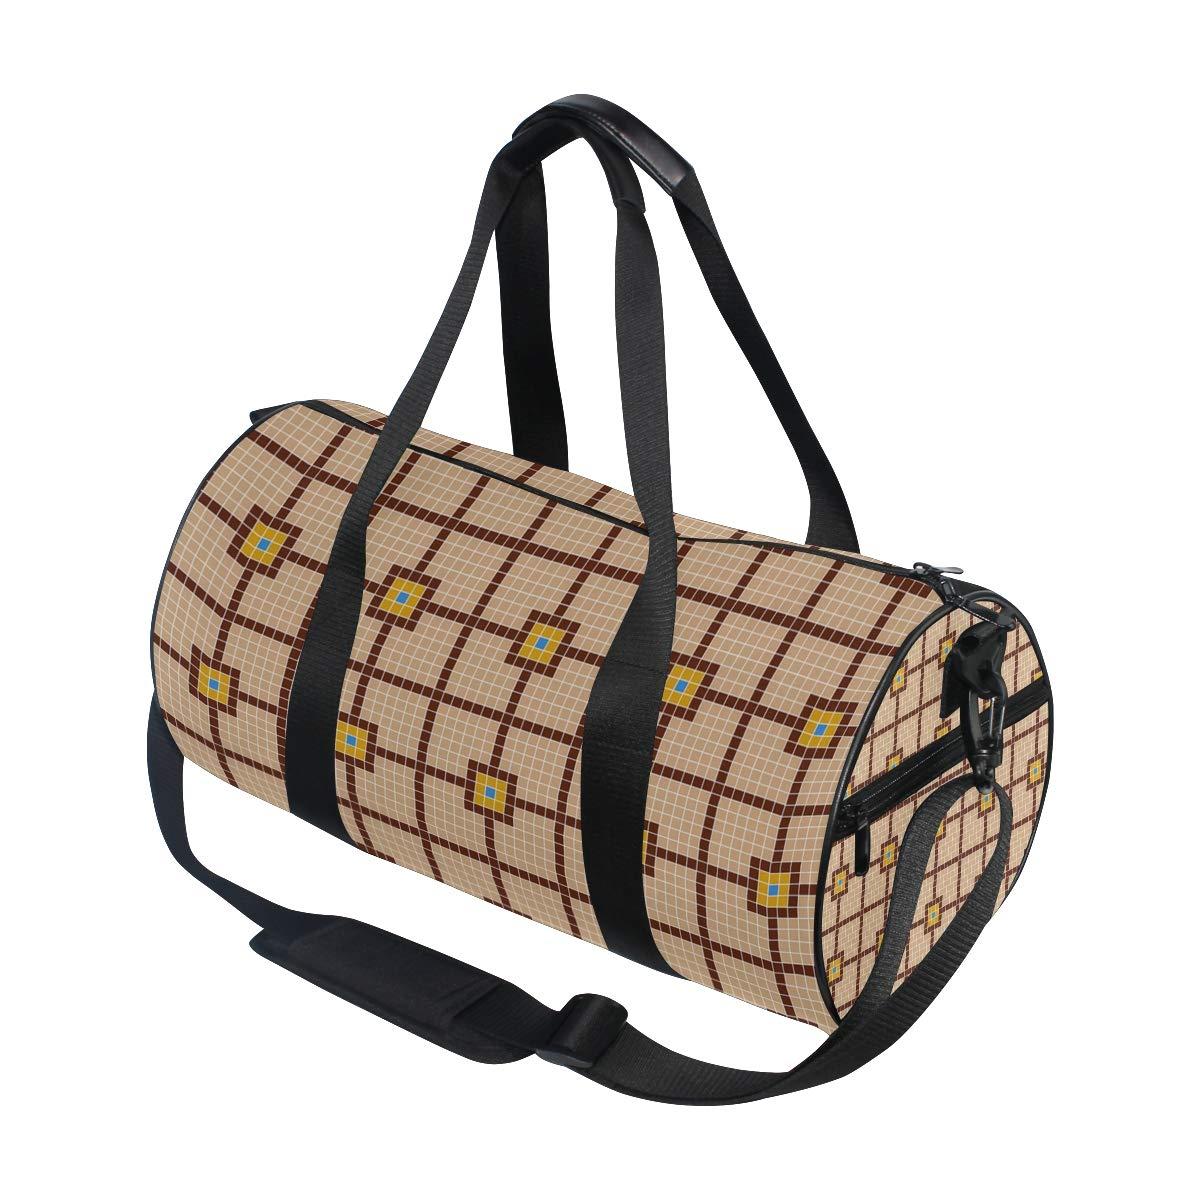 Floor Tile Ceramic PictureWaterproof Non-Slip Wearable Crossbody Bag fitness bag Shoulder Bag